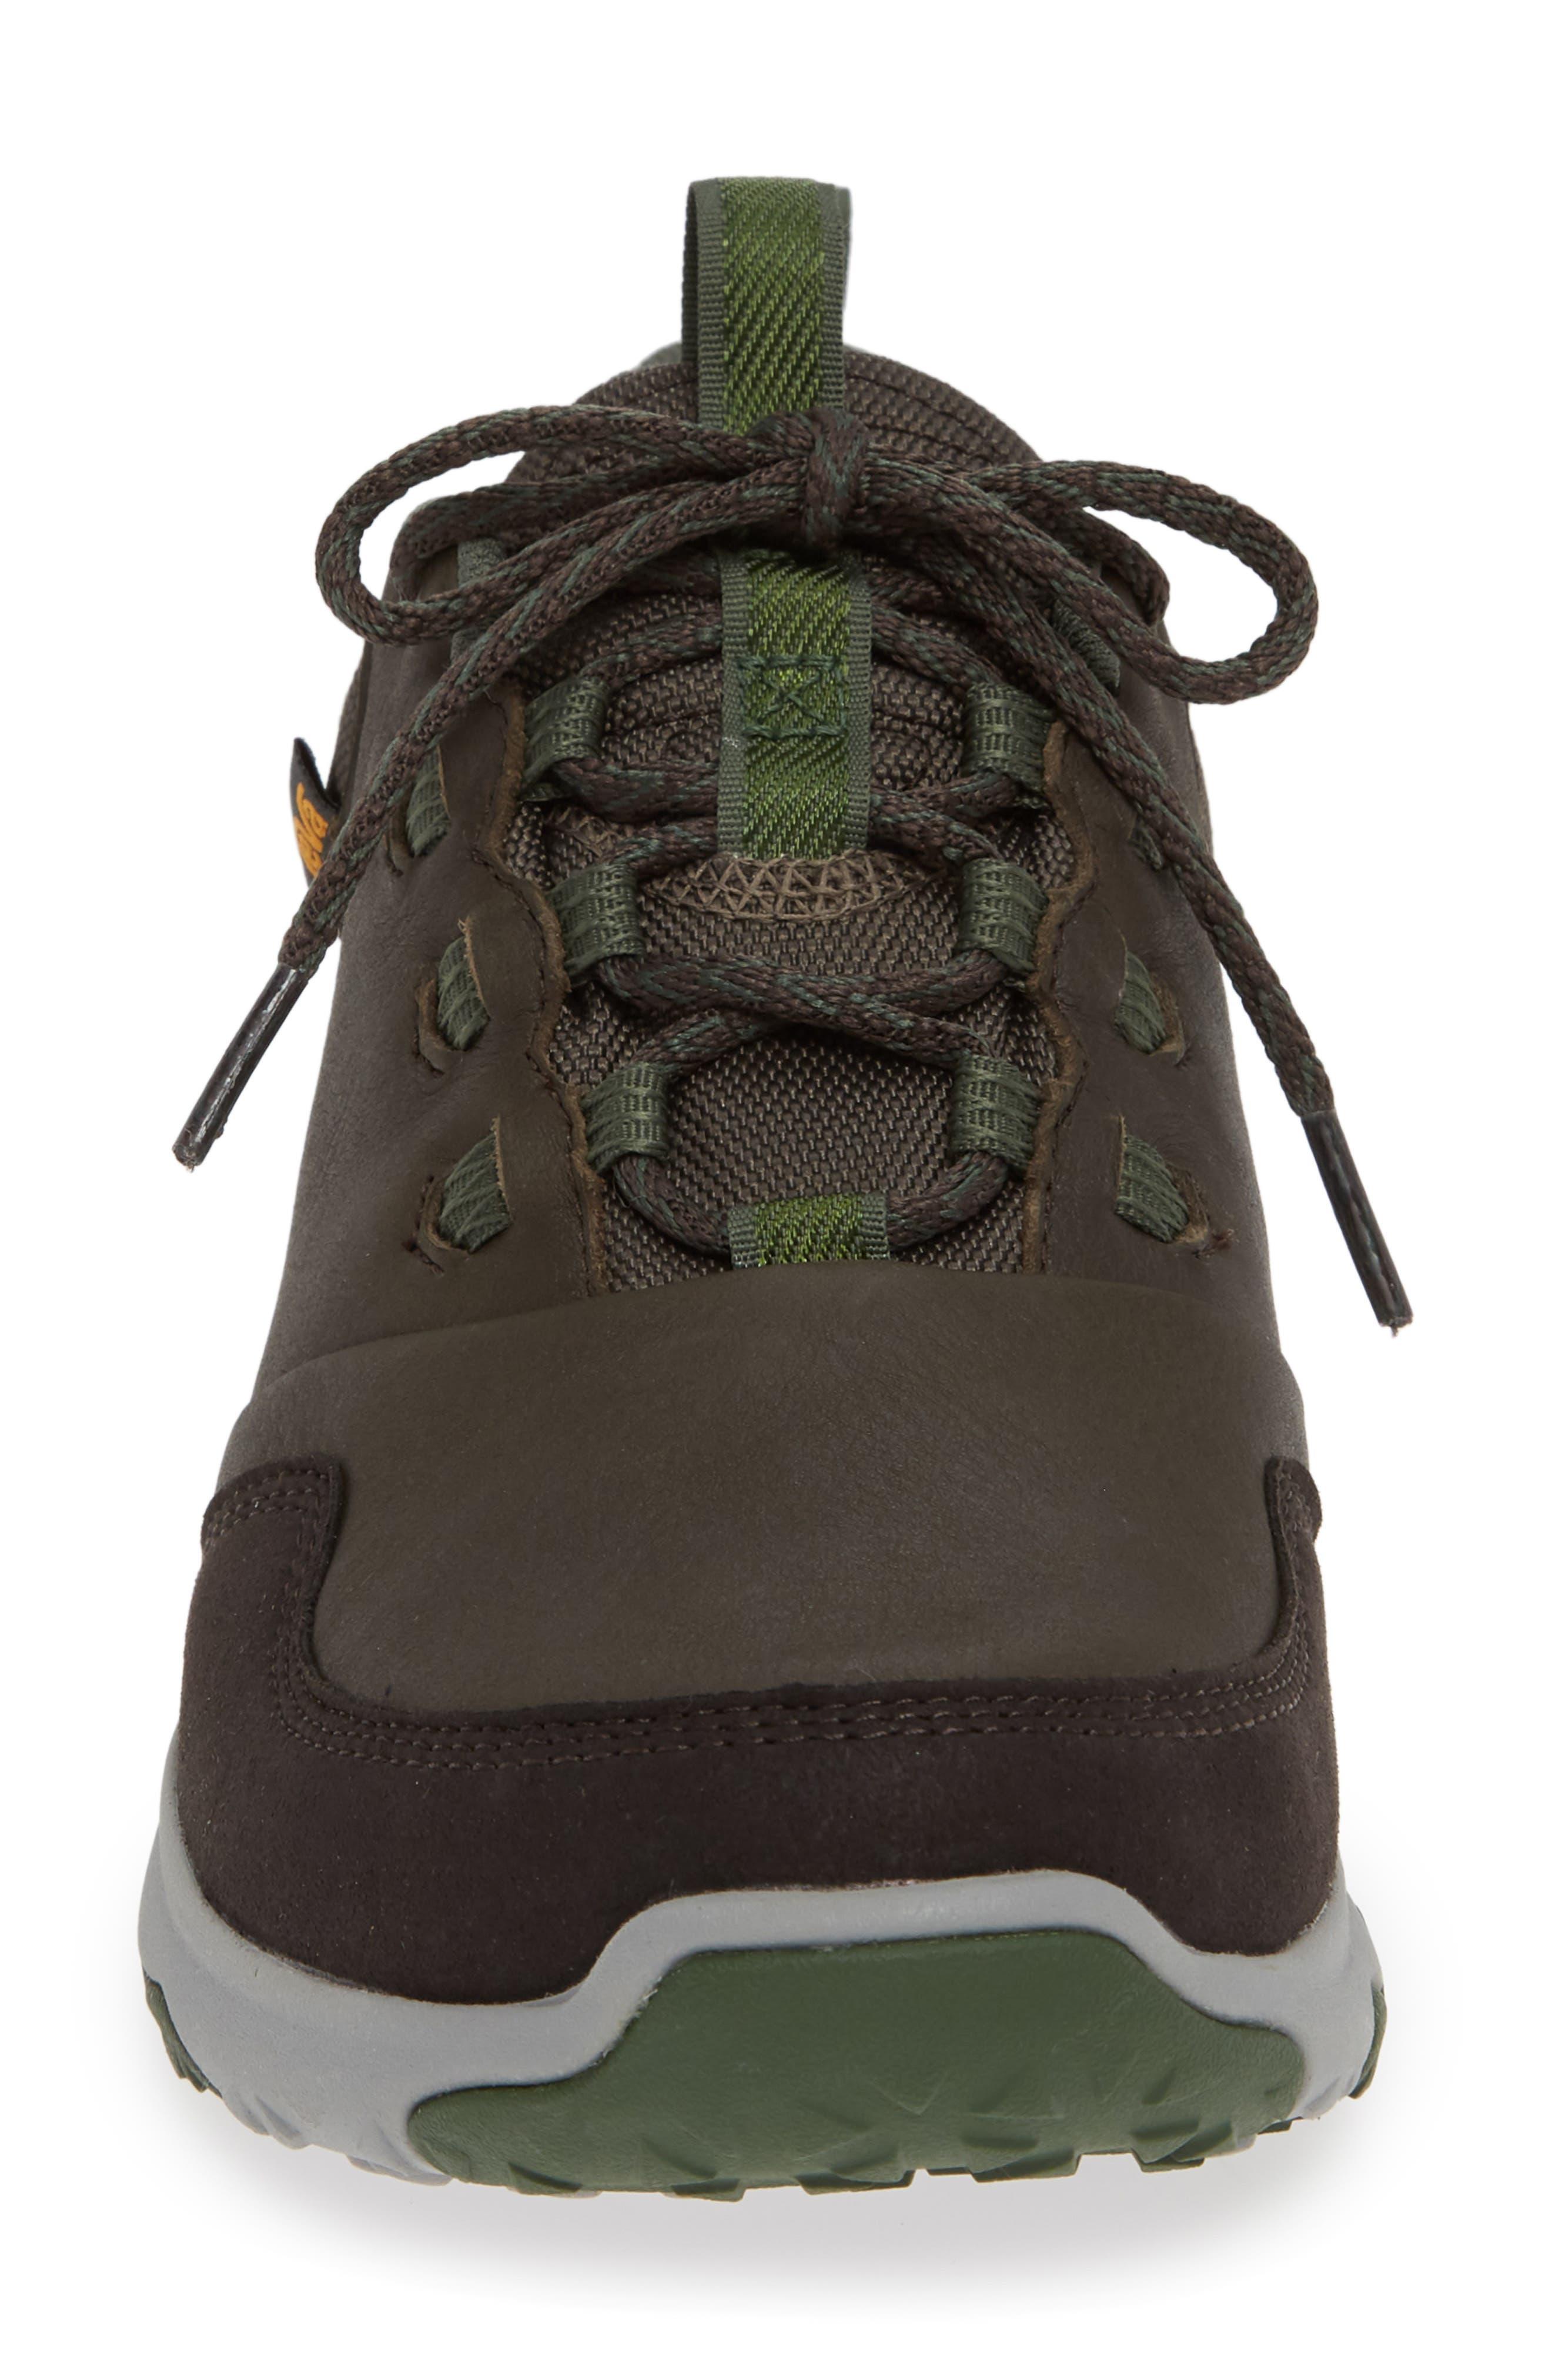 Arrowood Waterproof Sneaker,                             Alternate thumbnail 4, color,                             BLACK OLIVE LEATHER